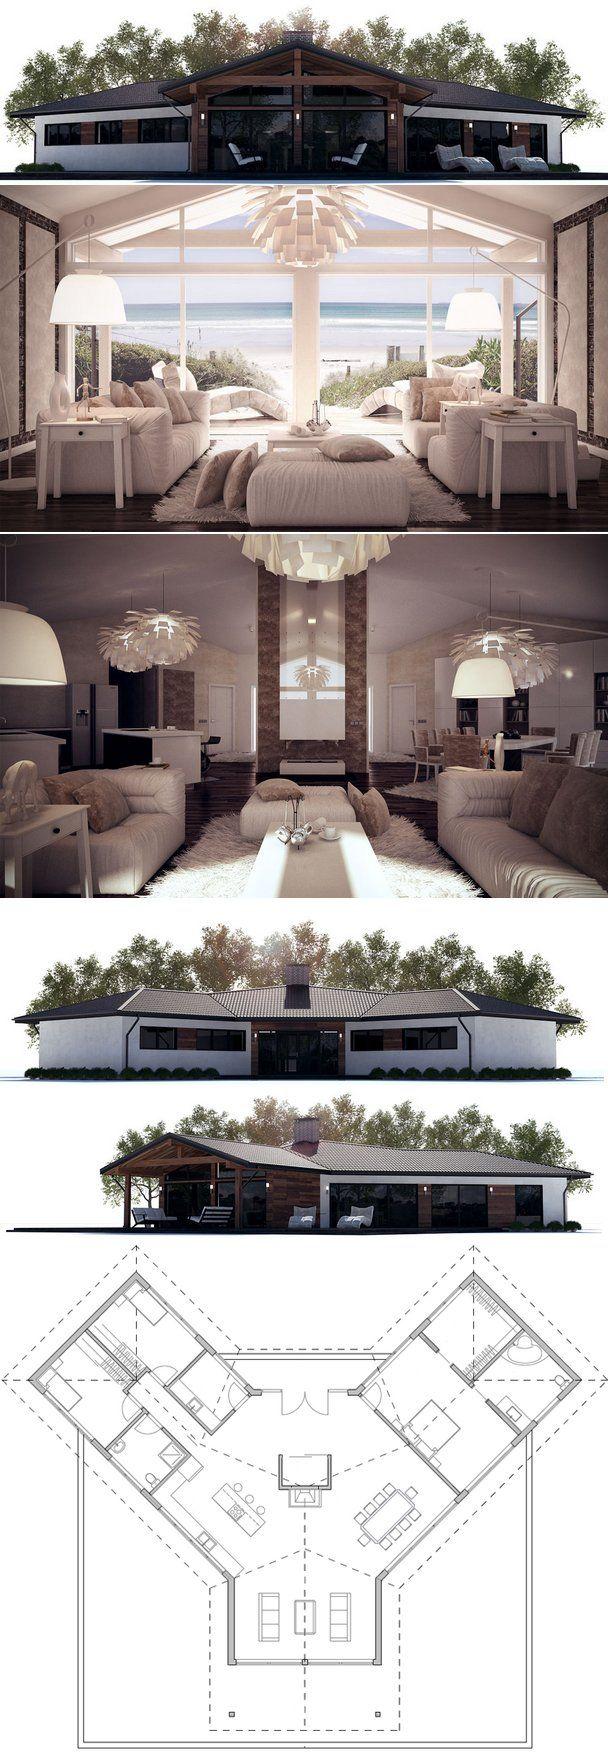 House Plan from ConceptHome.com. Small Home Design